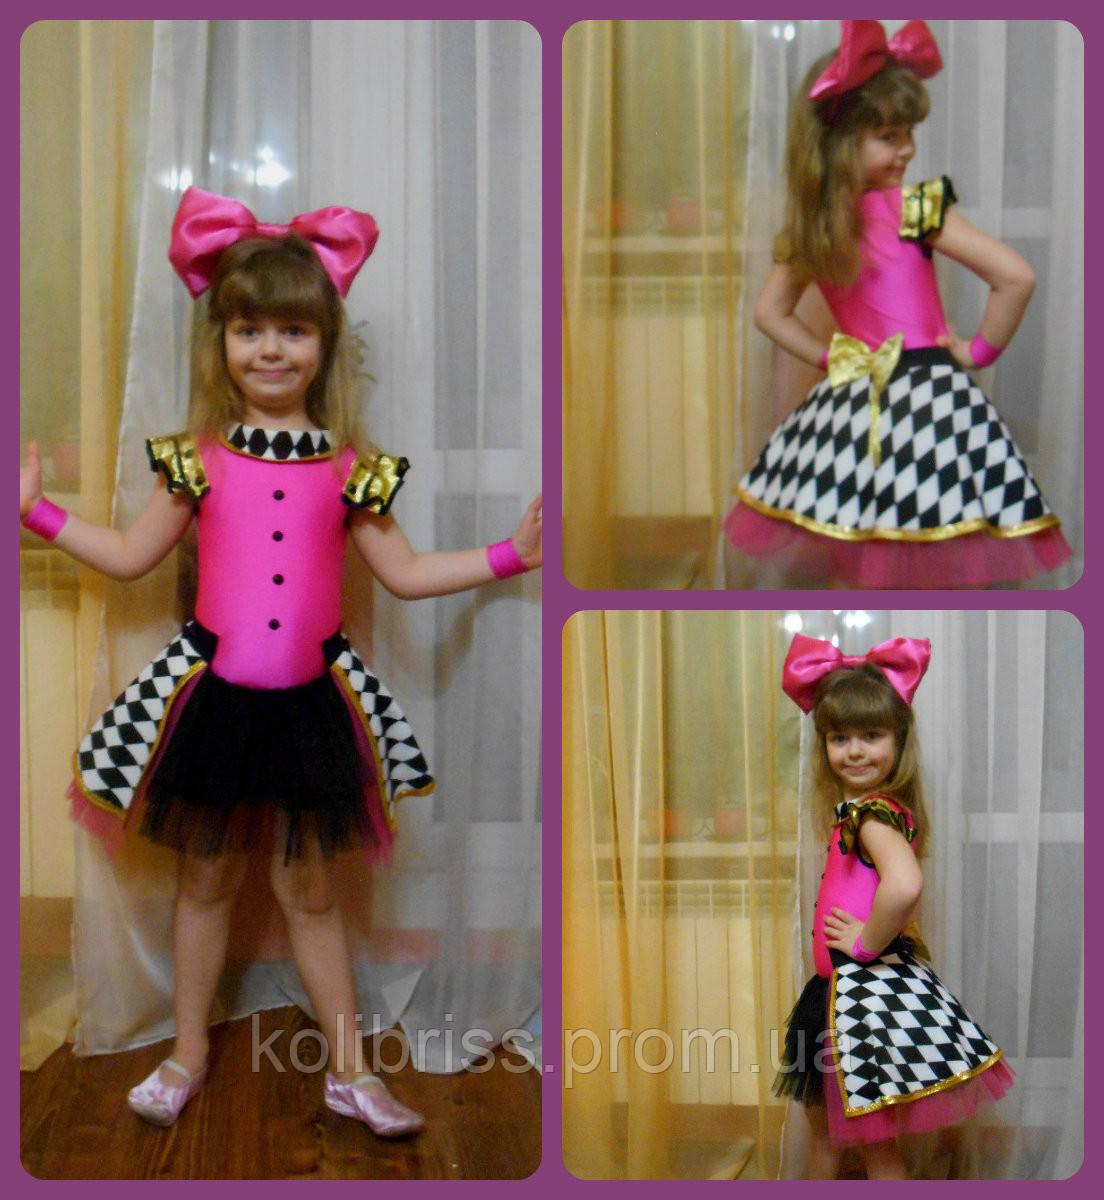 Карнавальный костюм шикарной куклы прокат. Костюм кукла прокат